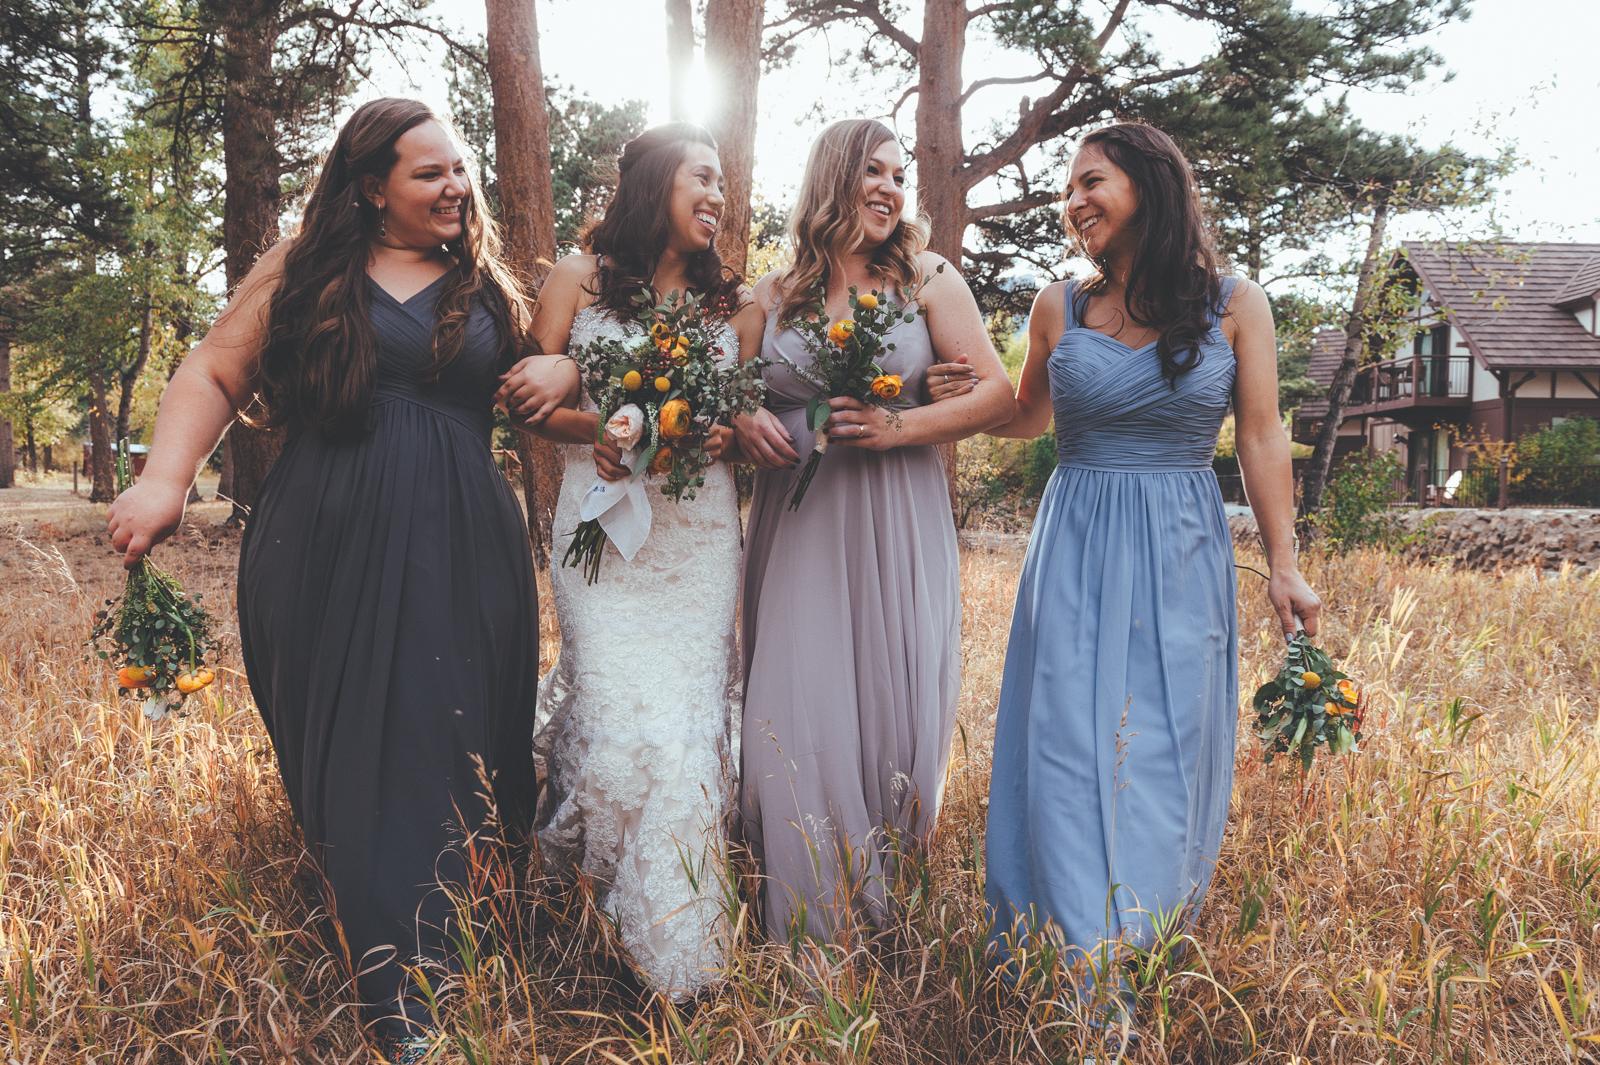 ChadFahnestockPhotography-estes-park-wedding-photography-033.jpg